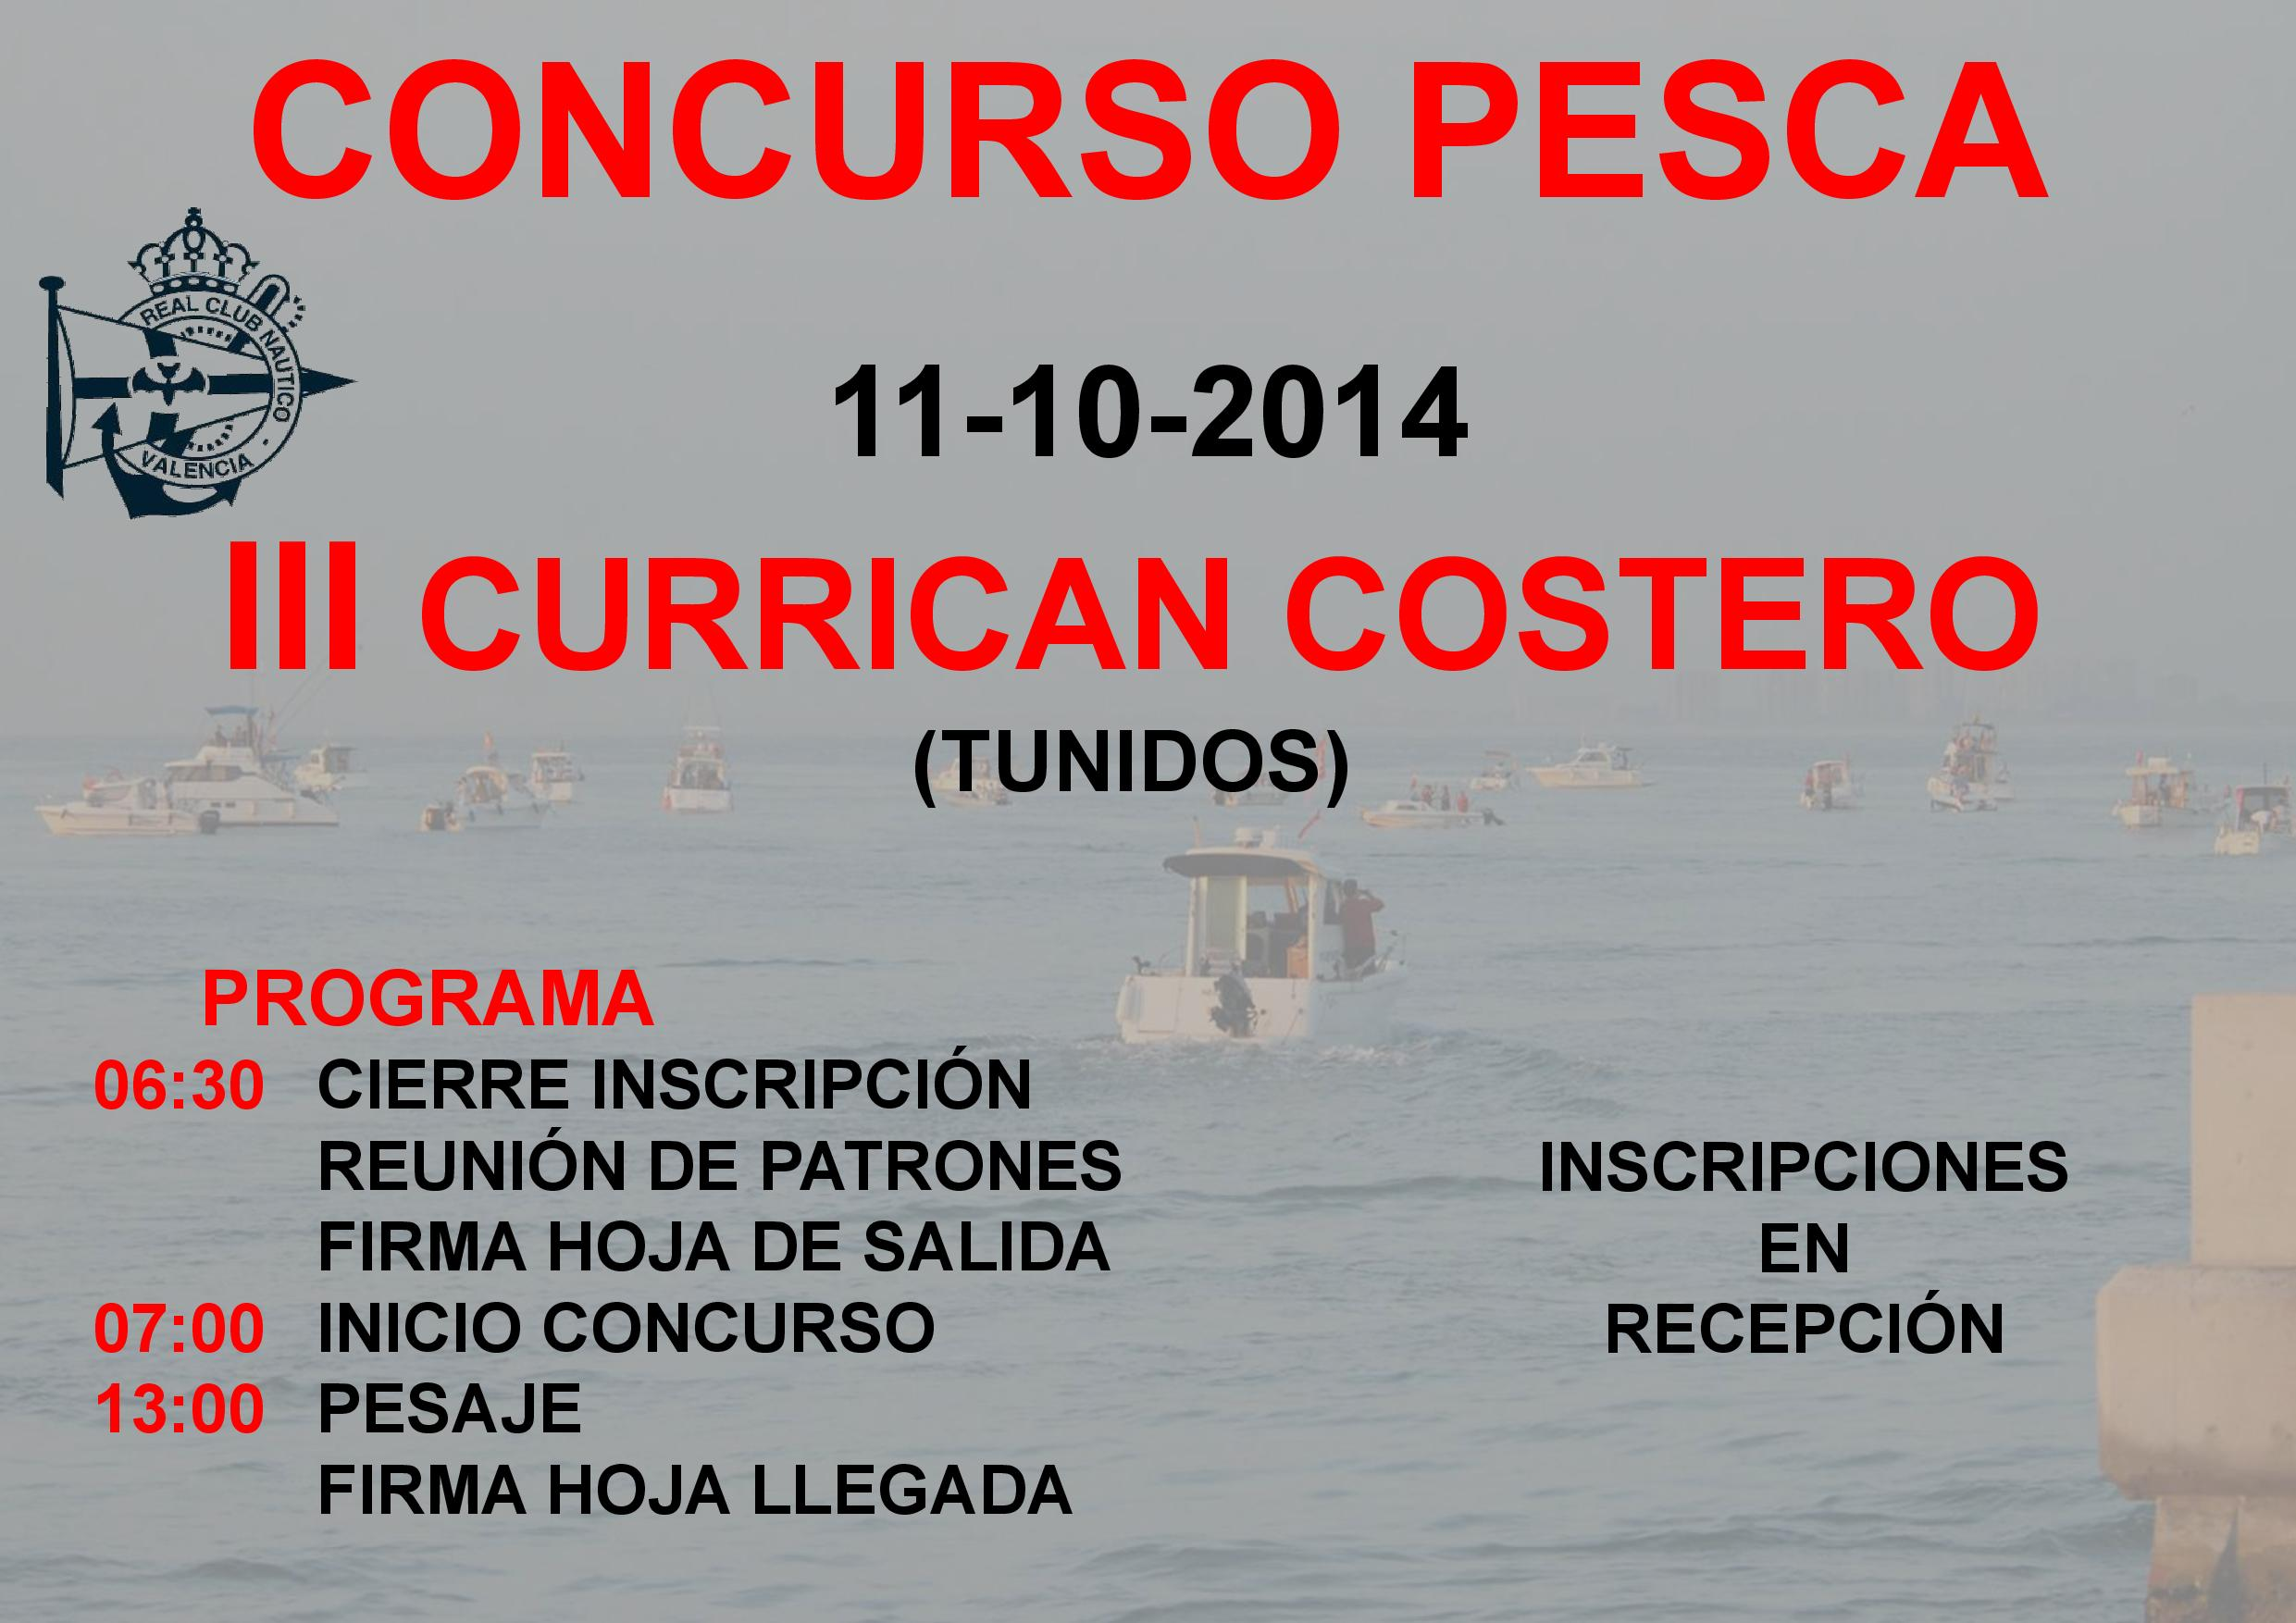 III Currican Costero Valencia